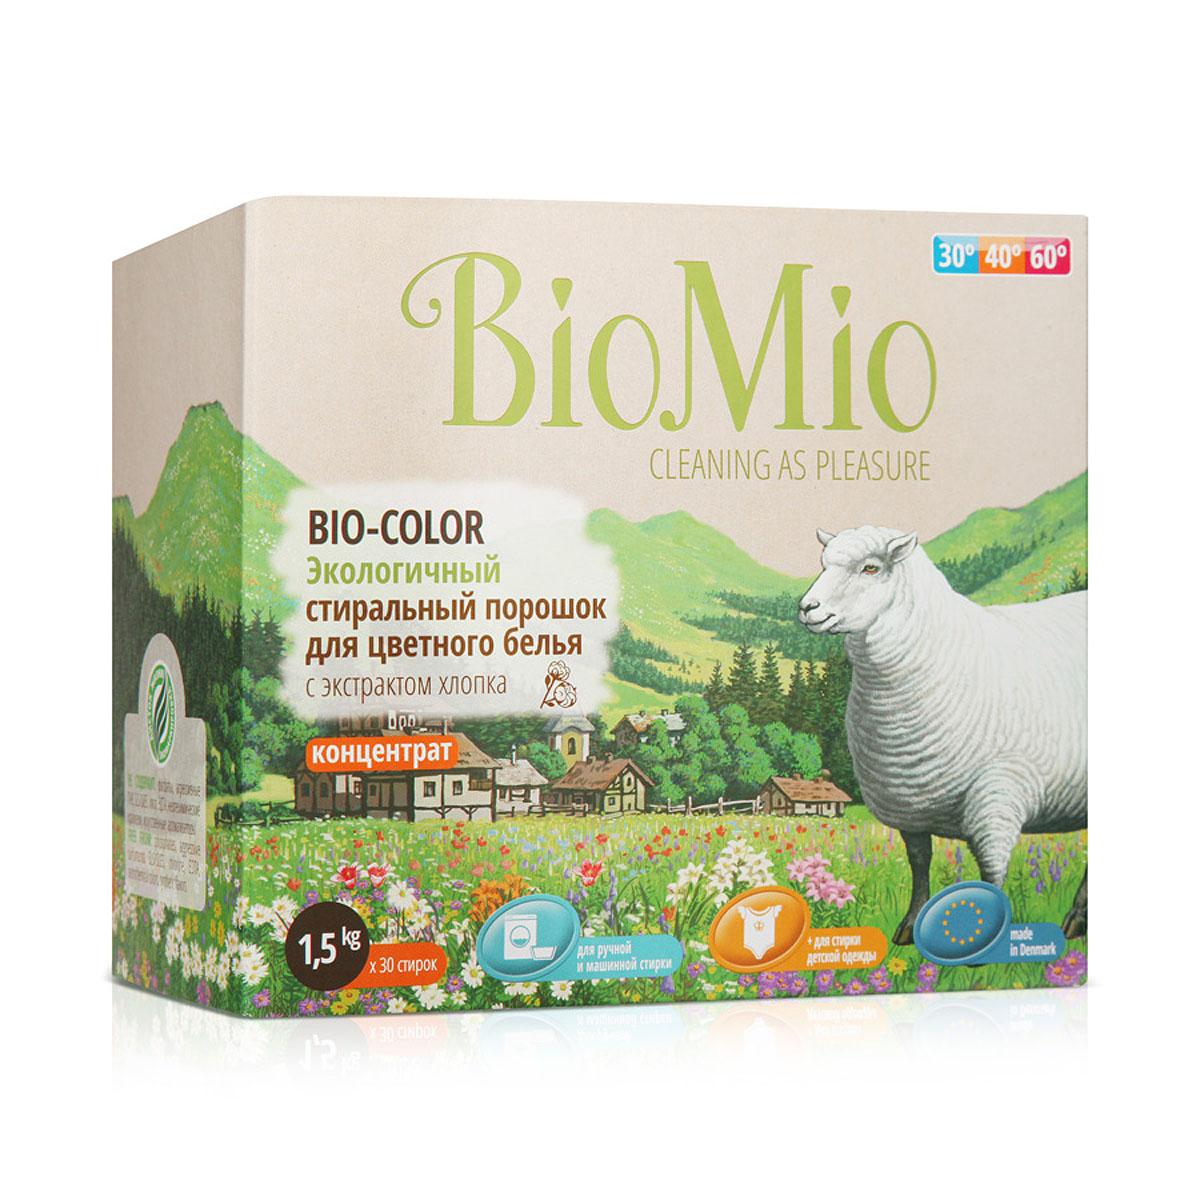 ���������� ������� BioMio, ��� �������� �����, � ���������� ������, 1,5 �� - BioMio��-415����������� ���������� ������� BioMio ���������� ������� ����� � �����������, �������� ��������� ����� � ������������ ����. �������� ��� ������ � �������� ������. ����������������� ������� ������������ ����������� ������. �������� �������� ��� ������ �������� ����� � ������ ����� � �������������� �����. ��������� ���������������, ��������� ��������� �� ���� ������ �������, ��������� �������� ����������� �������������� ����. �������� ��� ������ �� �������� ������� �����, ��� ������ ��� ��������� ���������� ��� ������� ������. ��������� ��� �������. �� ��������: �������, ����������� ���, SLS/SLES, ����, EDTA, ��������������� ���������, ������������� �������������. BioMio - ������� ����������� ������� ��� ����, ������������� ������� �������� ������ ������������. ������ �������� �� ������ �������� � ��������������� ���� ������������, �� � ����, ���� �����, ������� ����� �� ������ � ��������. ��������, ��������� � ������� � �������, ������� � ���� � ��������...